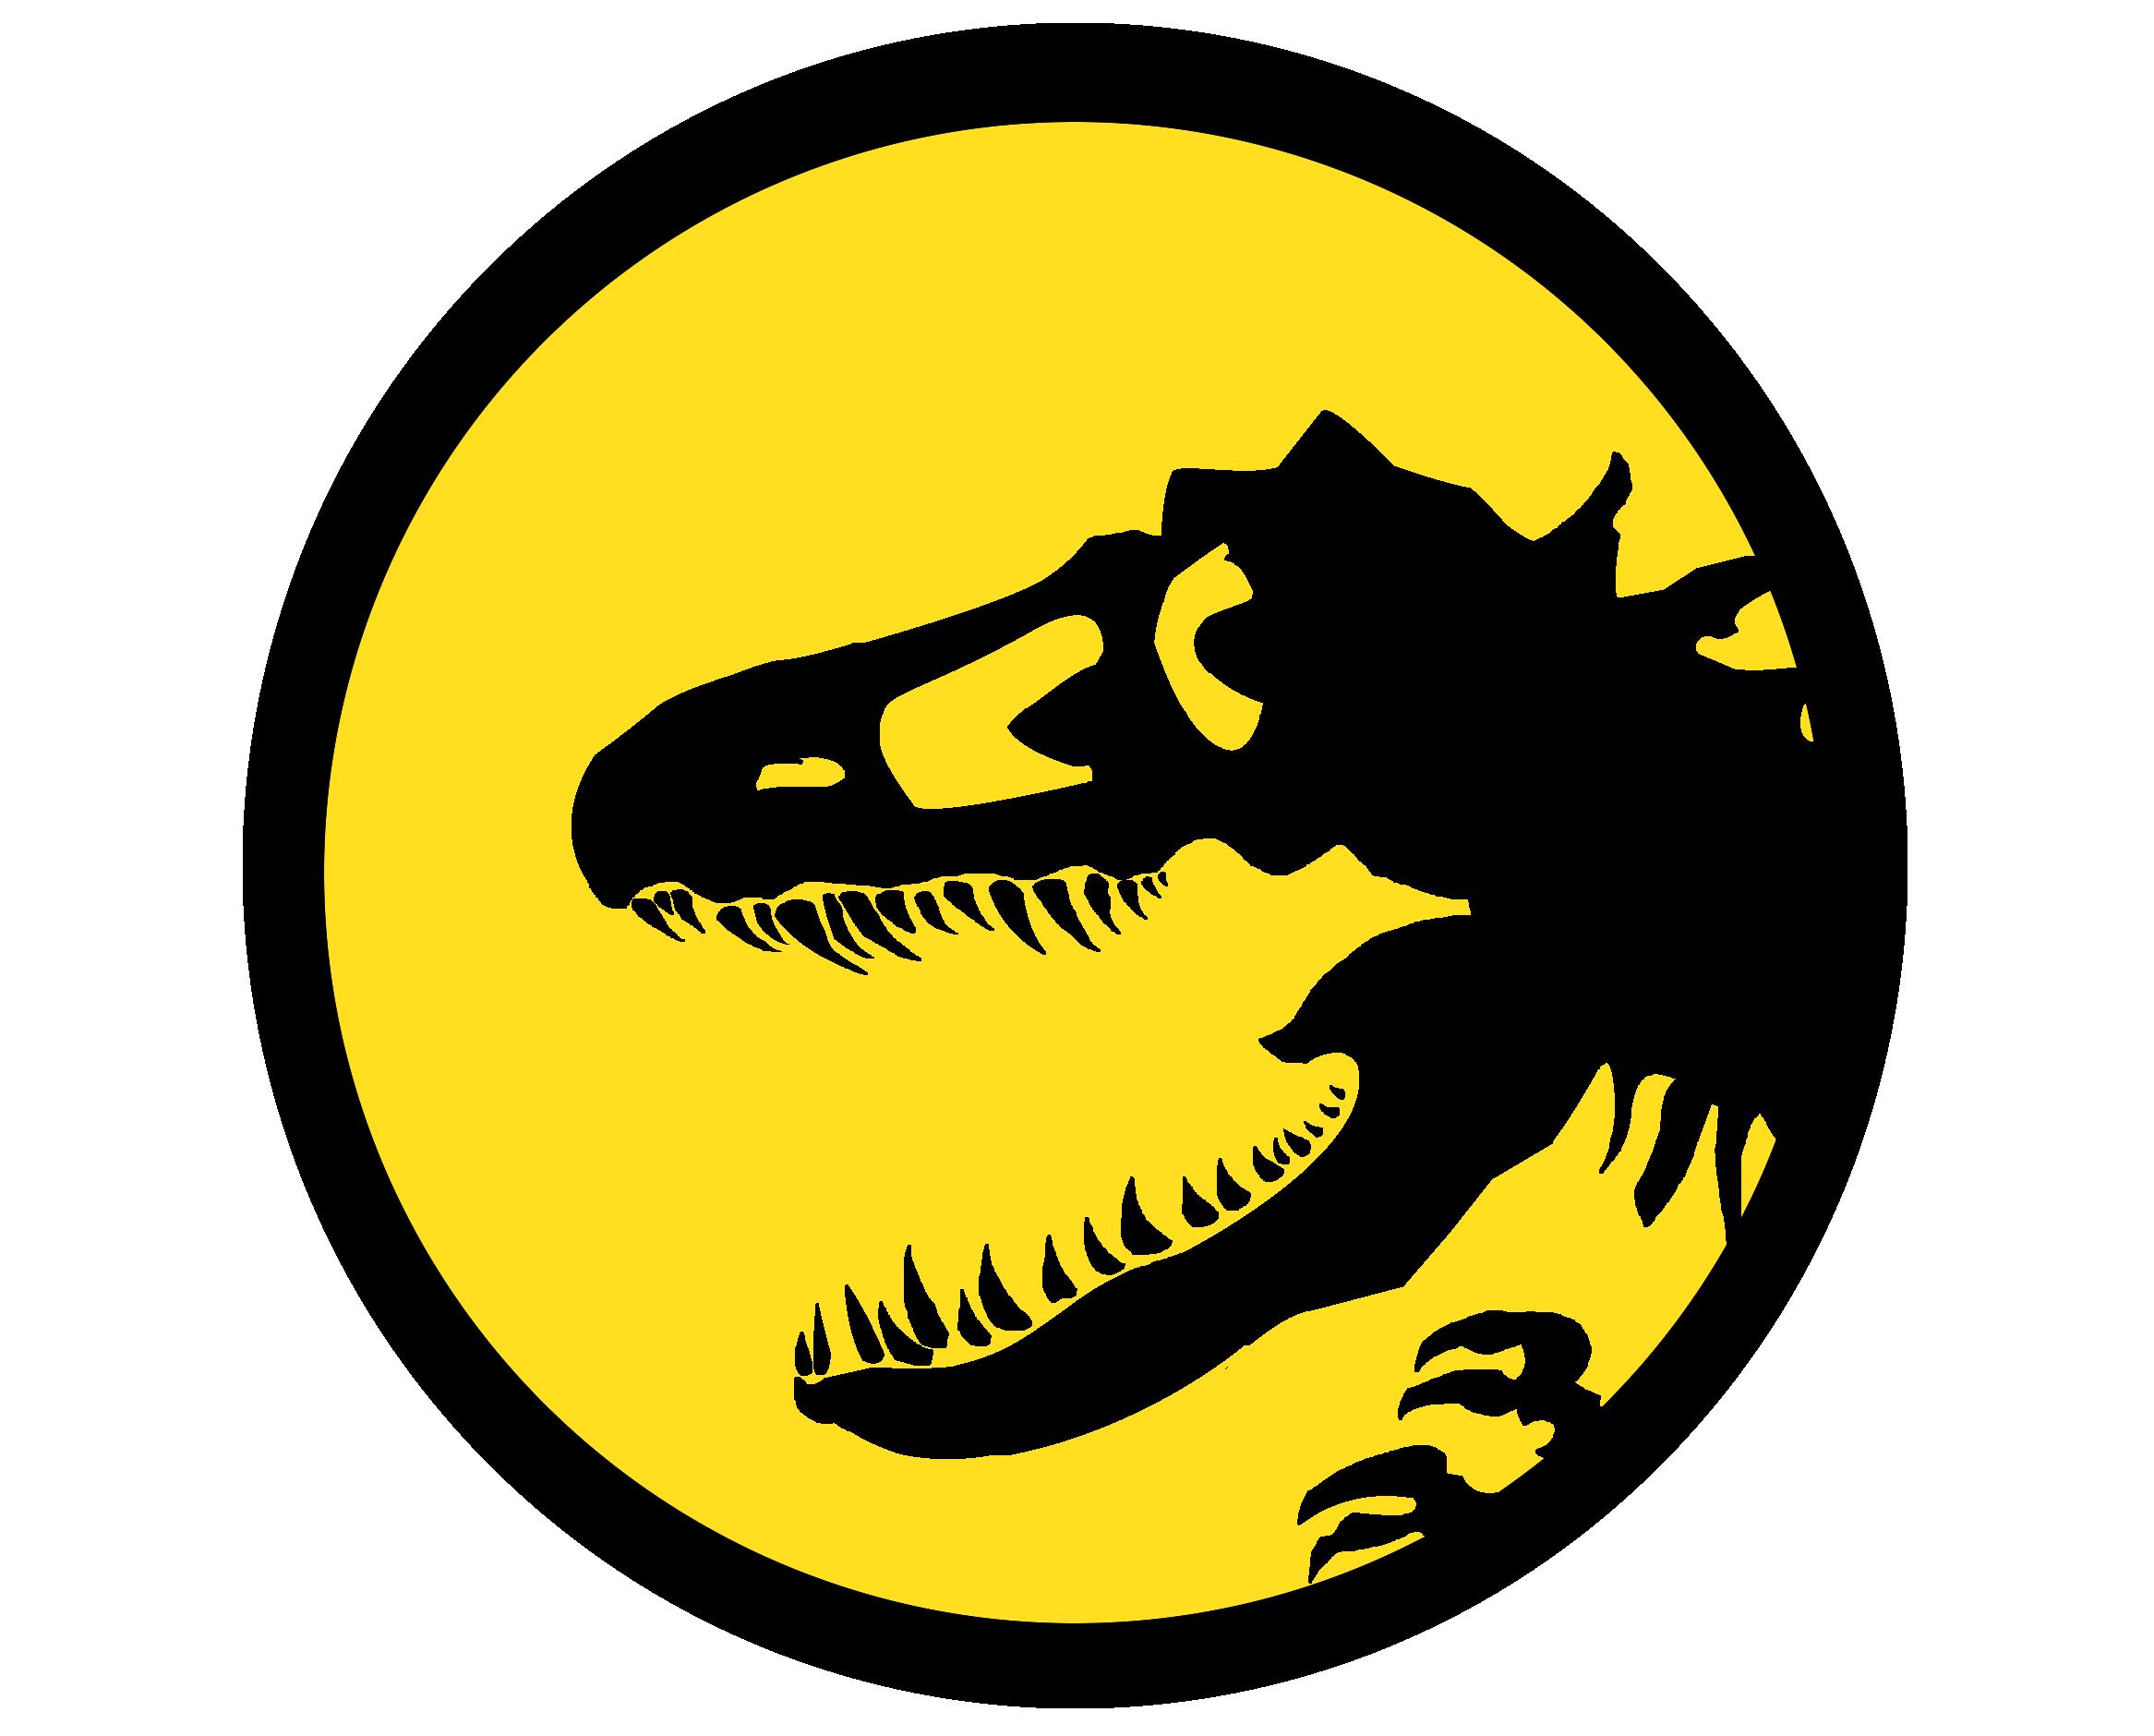 Yellow Jurassic Park Car